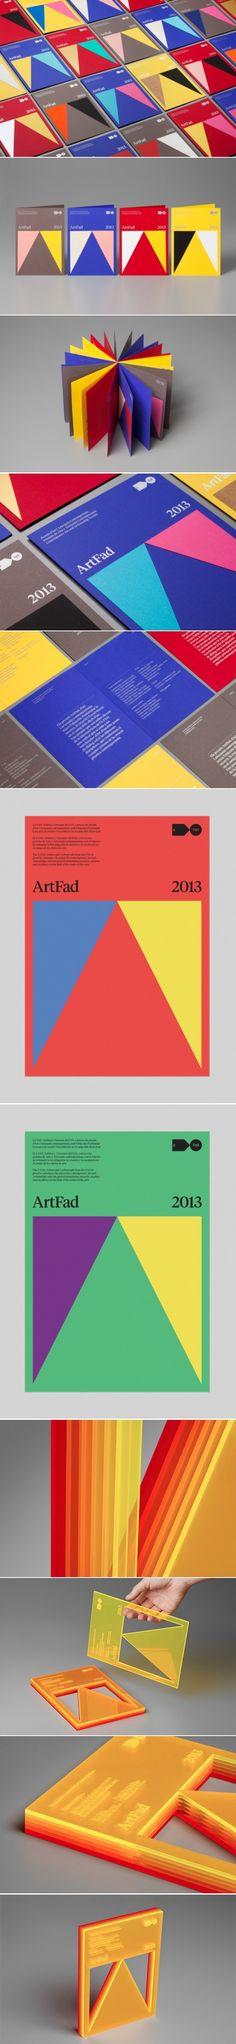 Hey Studio – Artfad 2013 Identity